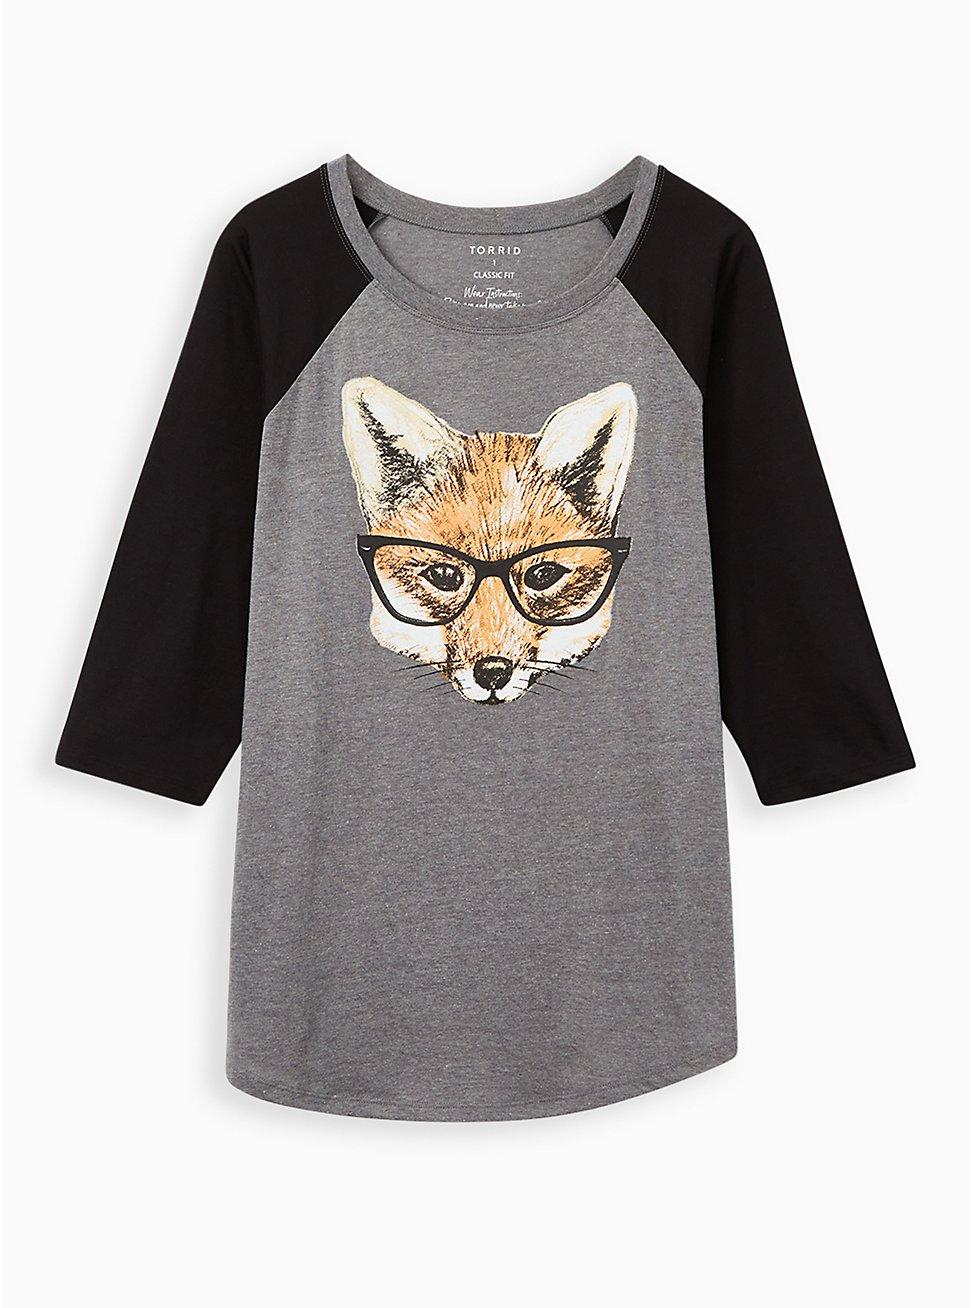 Classic Fit Raglan Tee - Fox Glasses Grey & Black, MEDIUM HEATHER GREY, hi-res